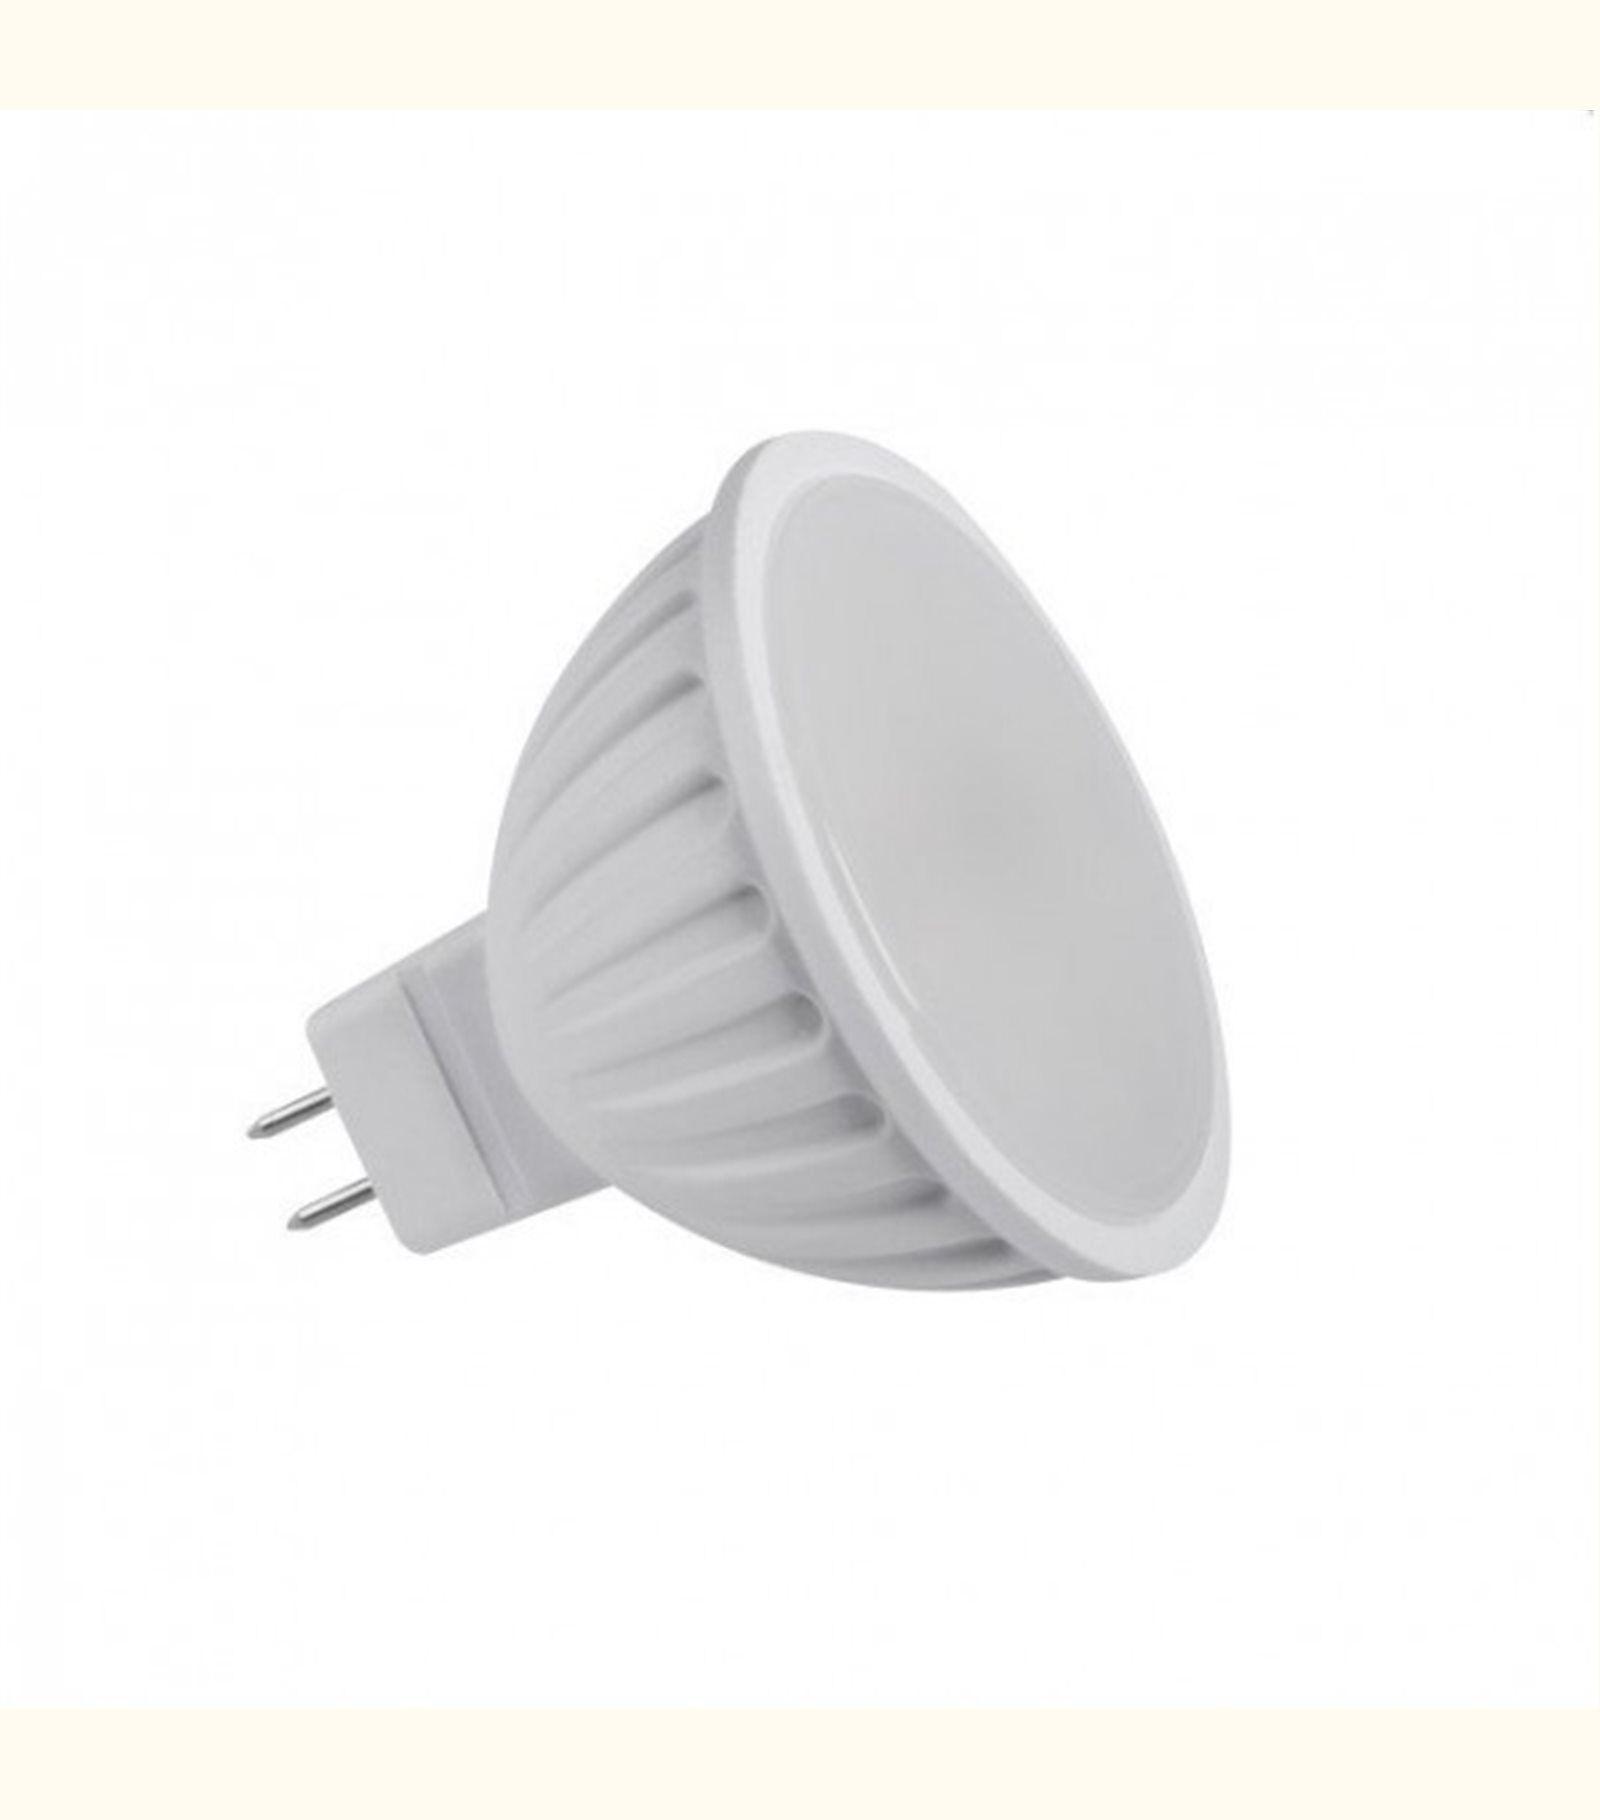 Kanlux Spot LED GU5.3 7 watt (eq. 40 watt) - Couleur - Blanc froid 6500°K